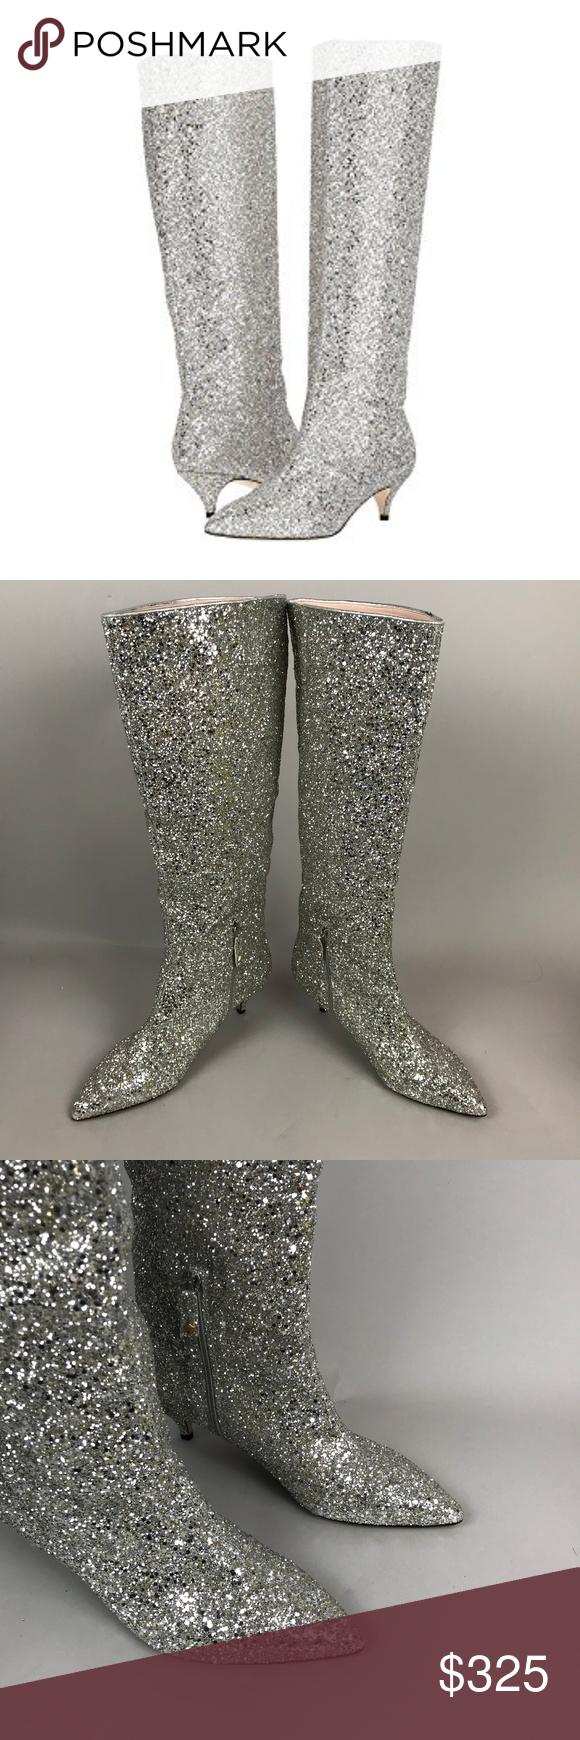 1aa168e4b66a Kate Spade Olina Silver Glitter Boots Kitten Heel Kate Spade Olina Silver  Glitter Boots Kitten Heel